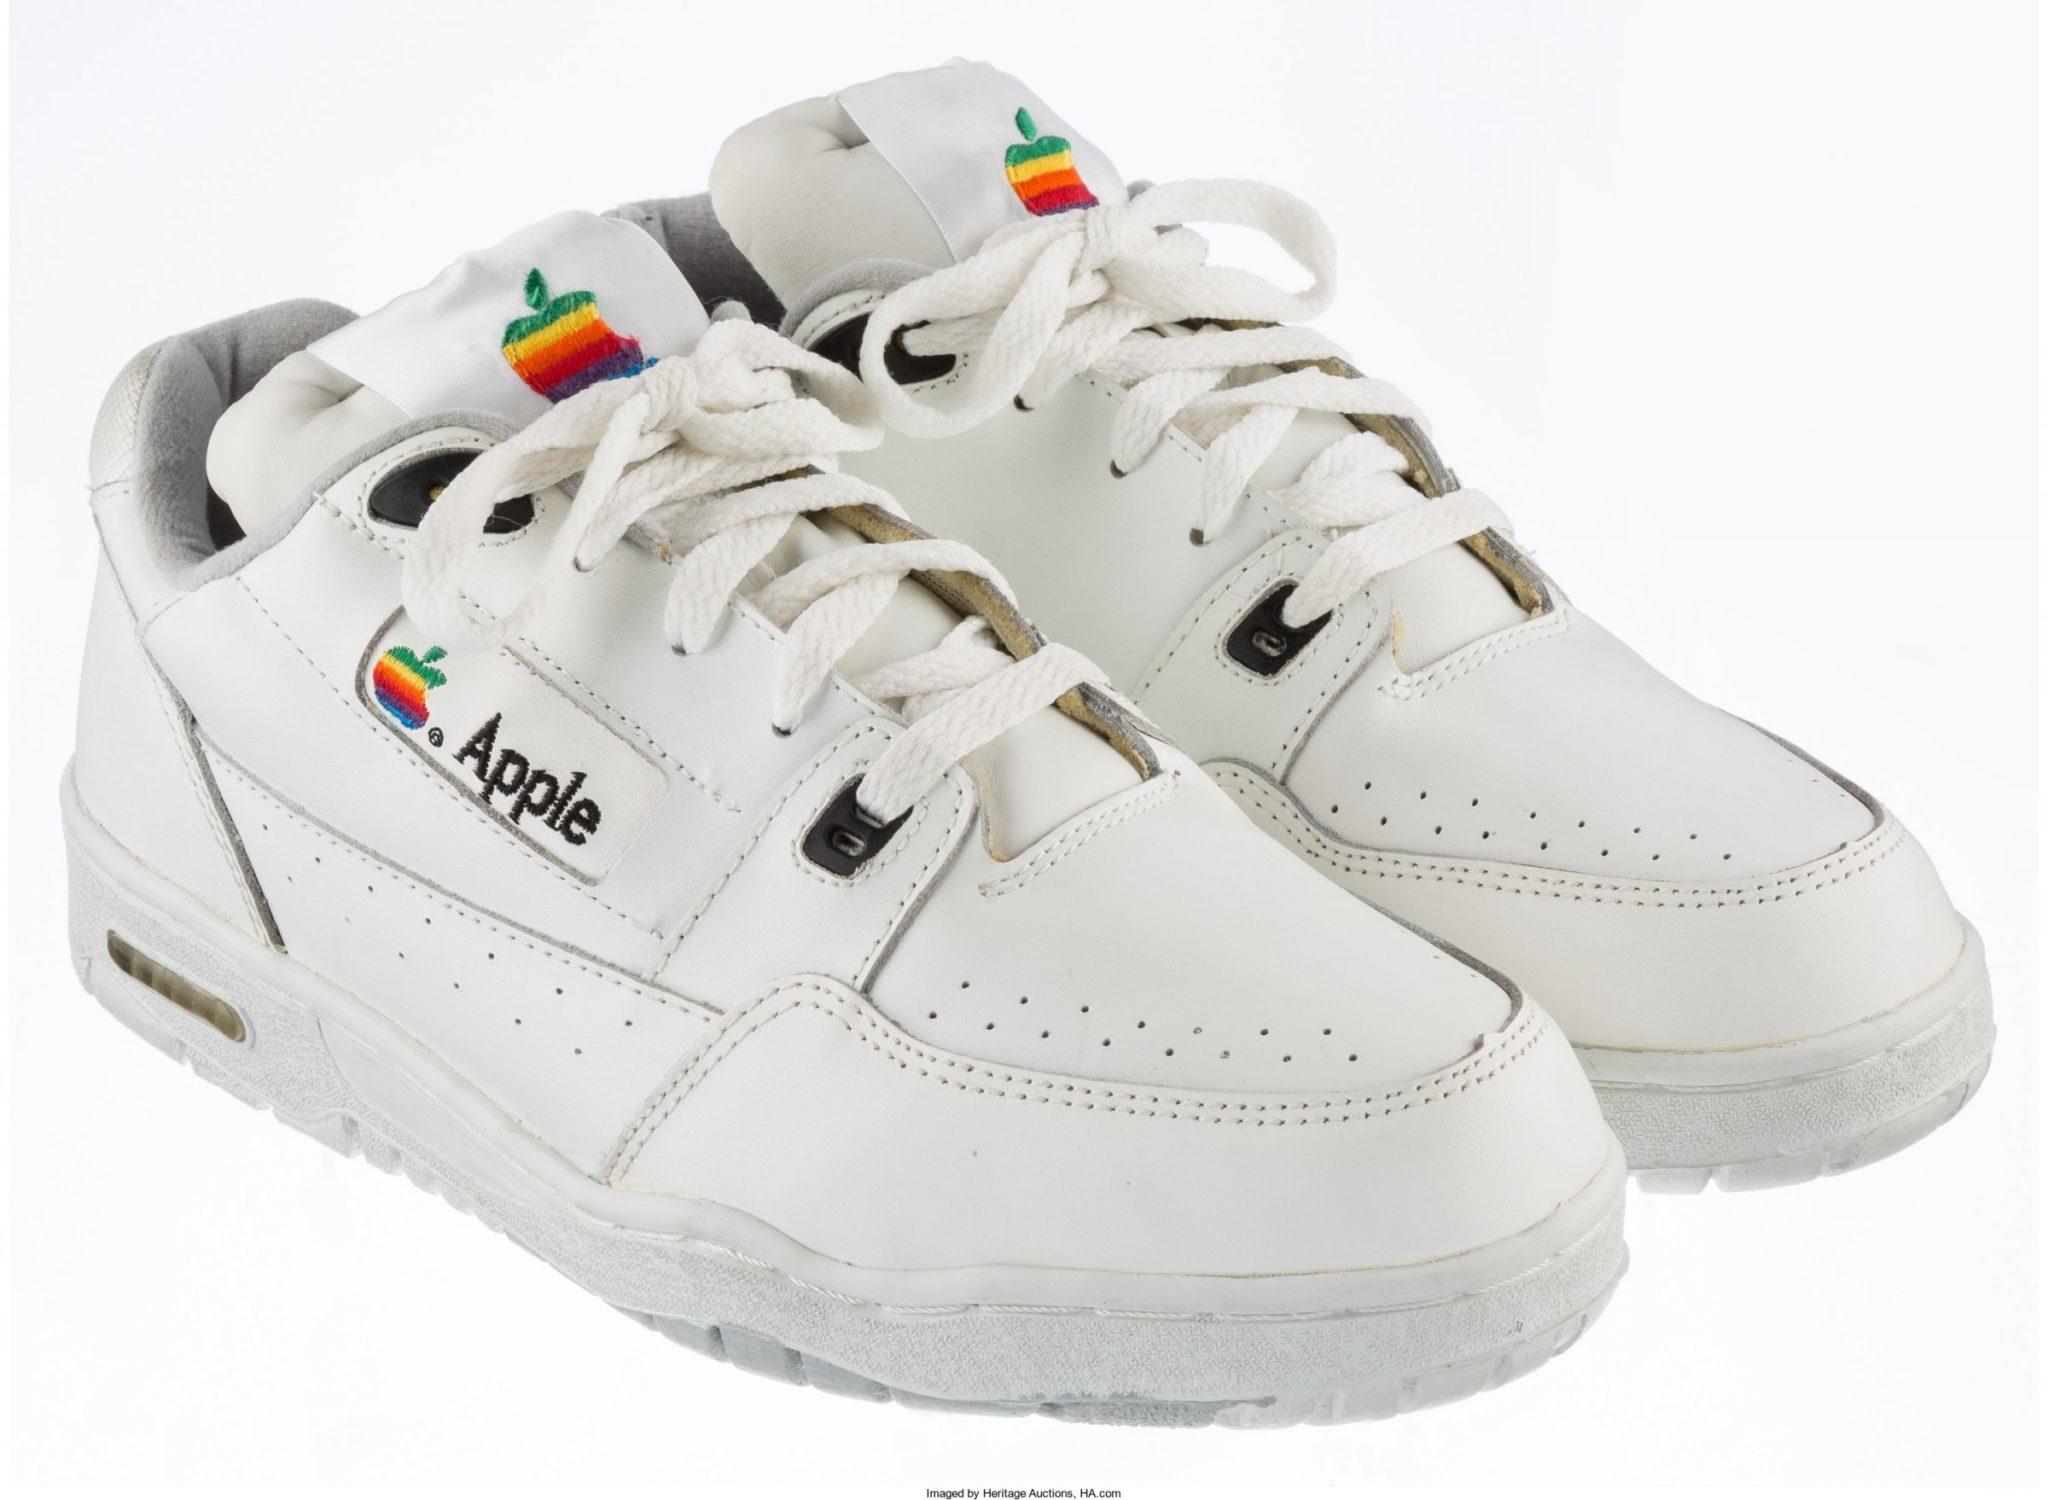 biale buty z kolorowym logo apple